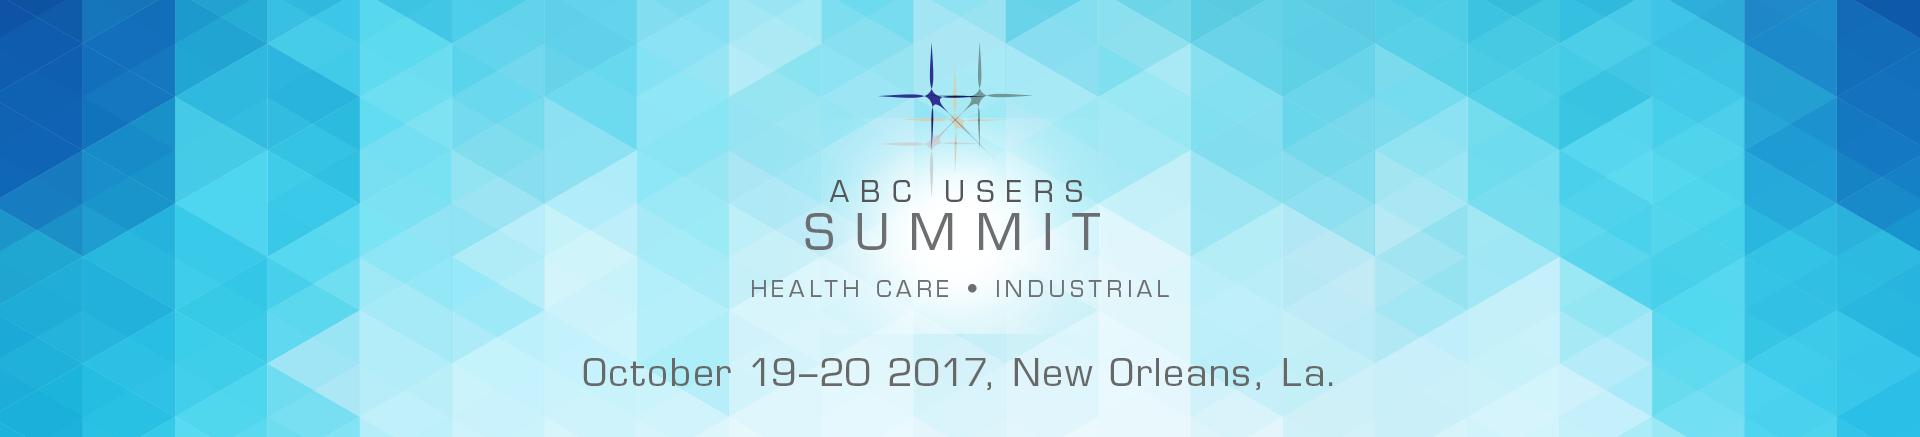 2017 ABC Users Summit